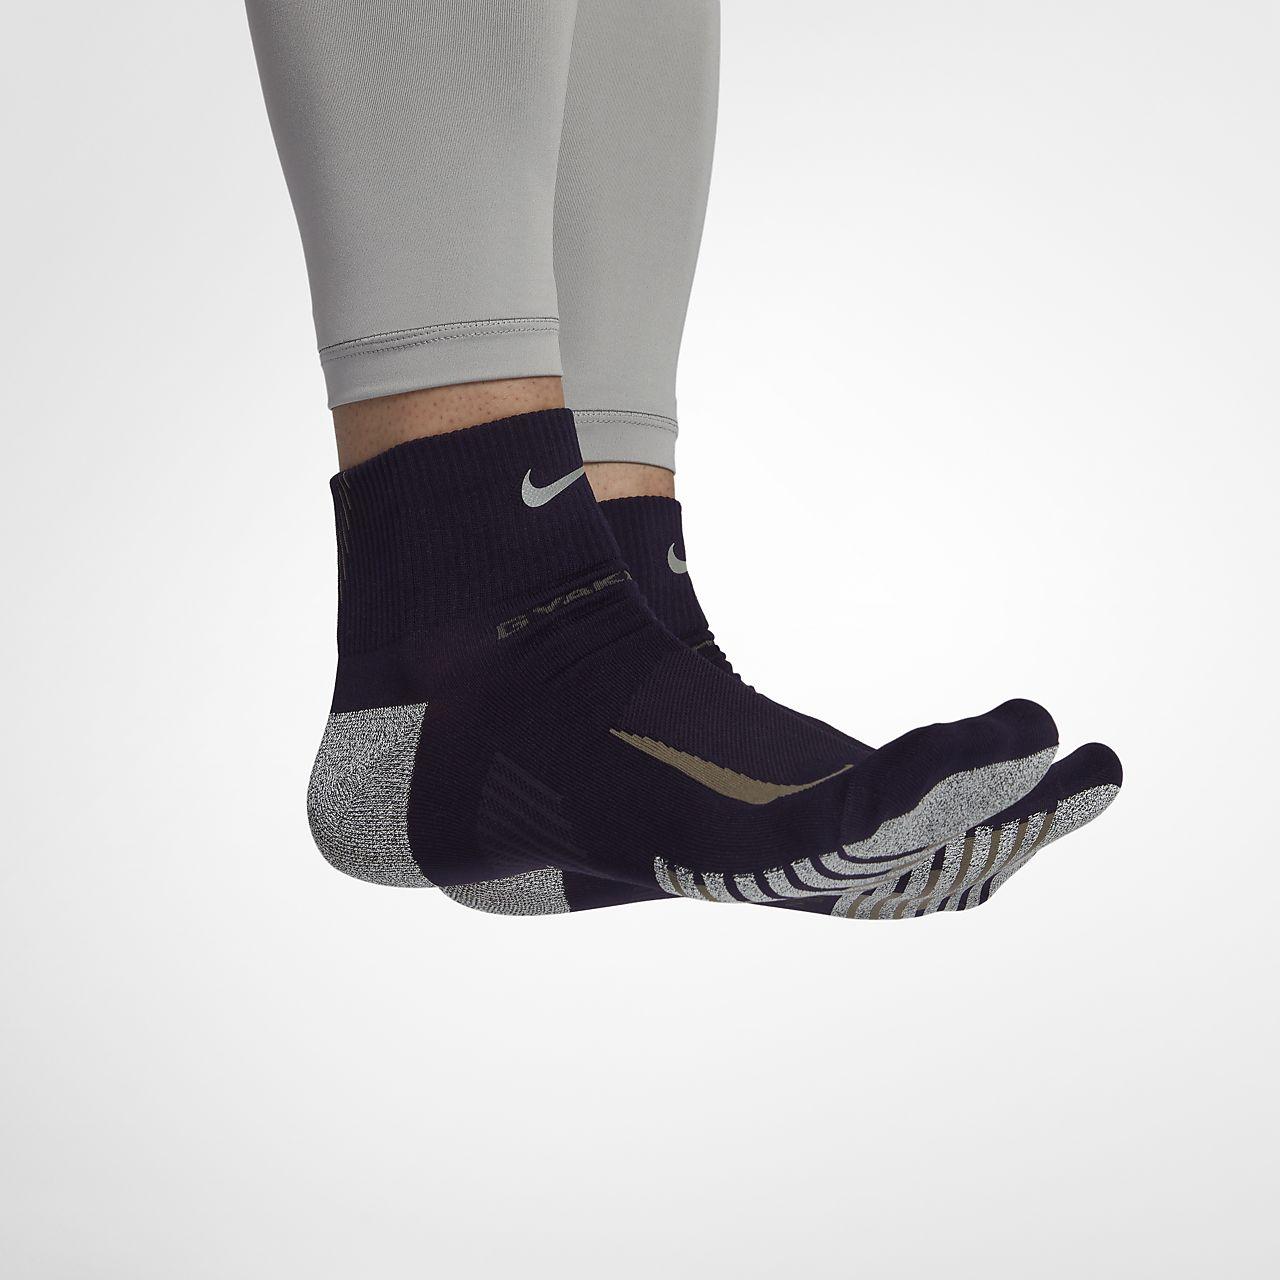 54d0559a4 Nike Gyakusou NikeGrip Unisex Quarter Sock. Nike.com AU